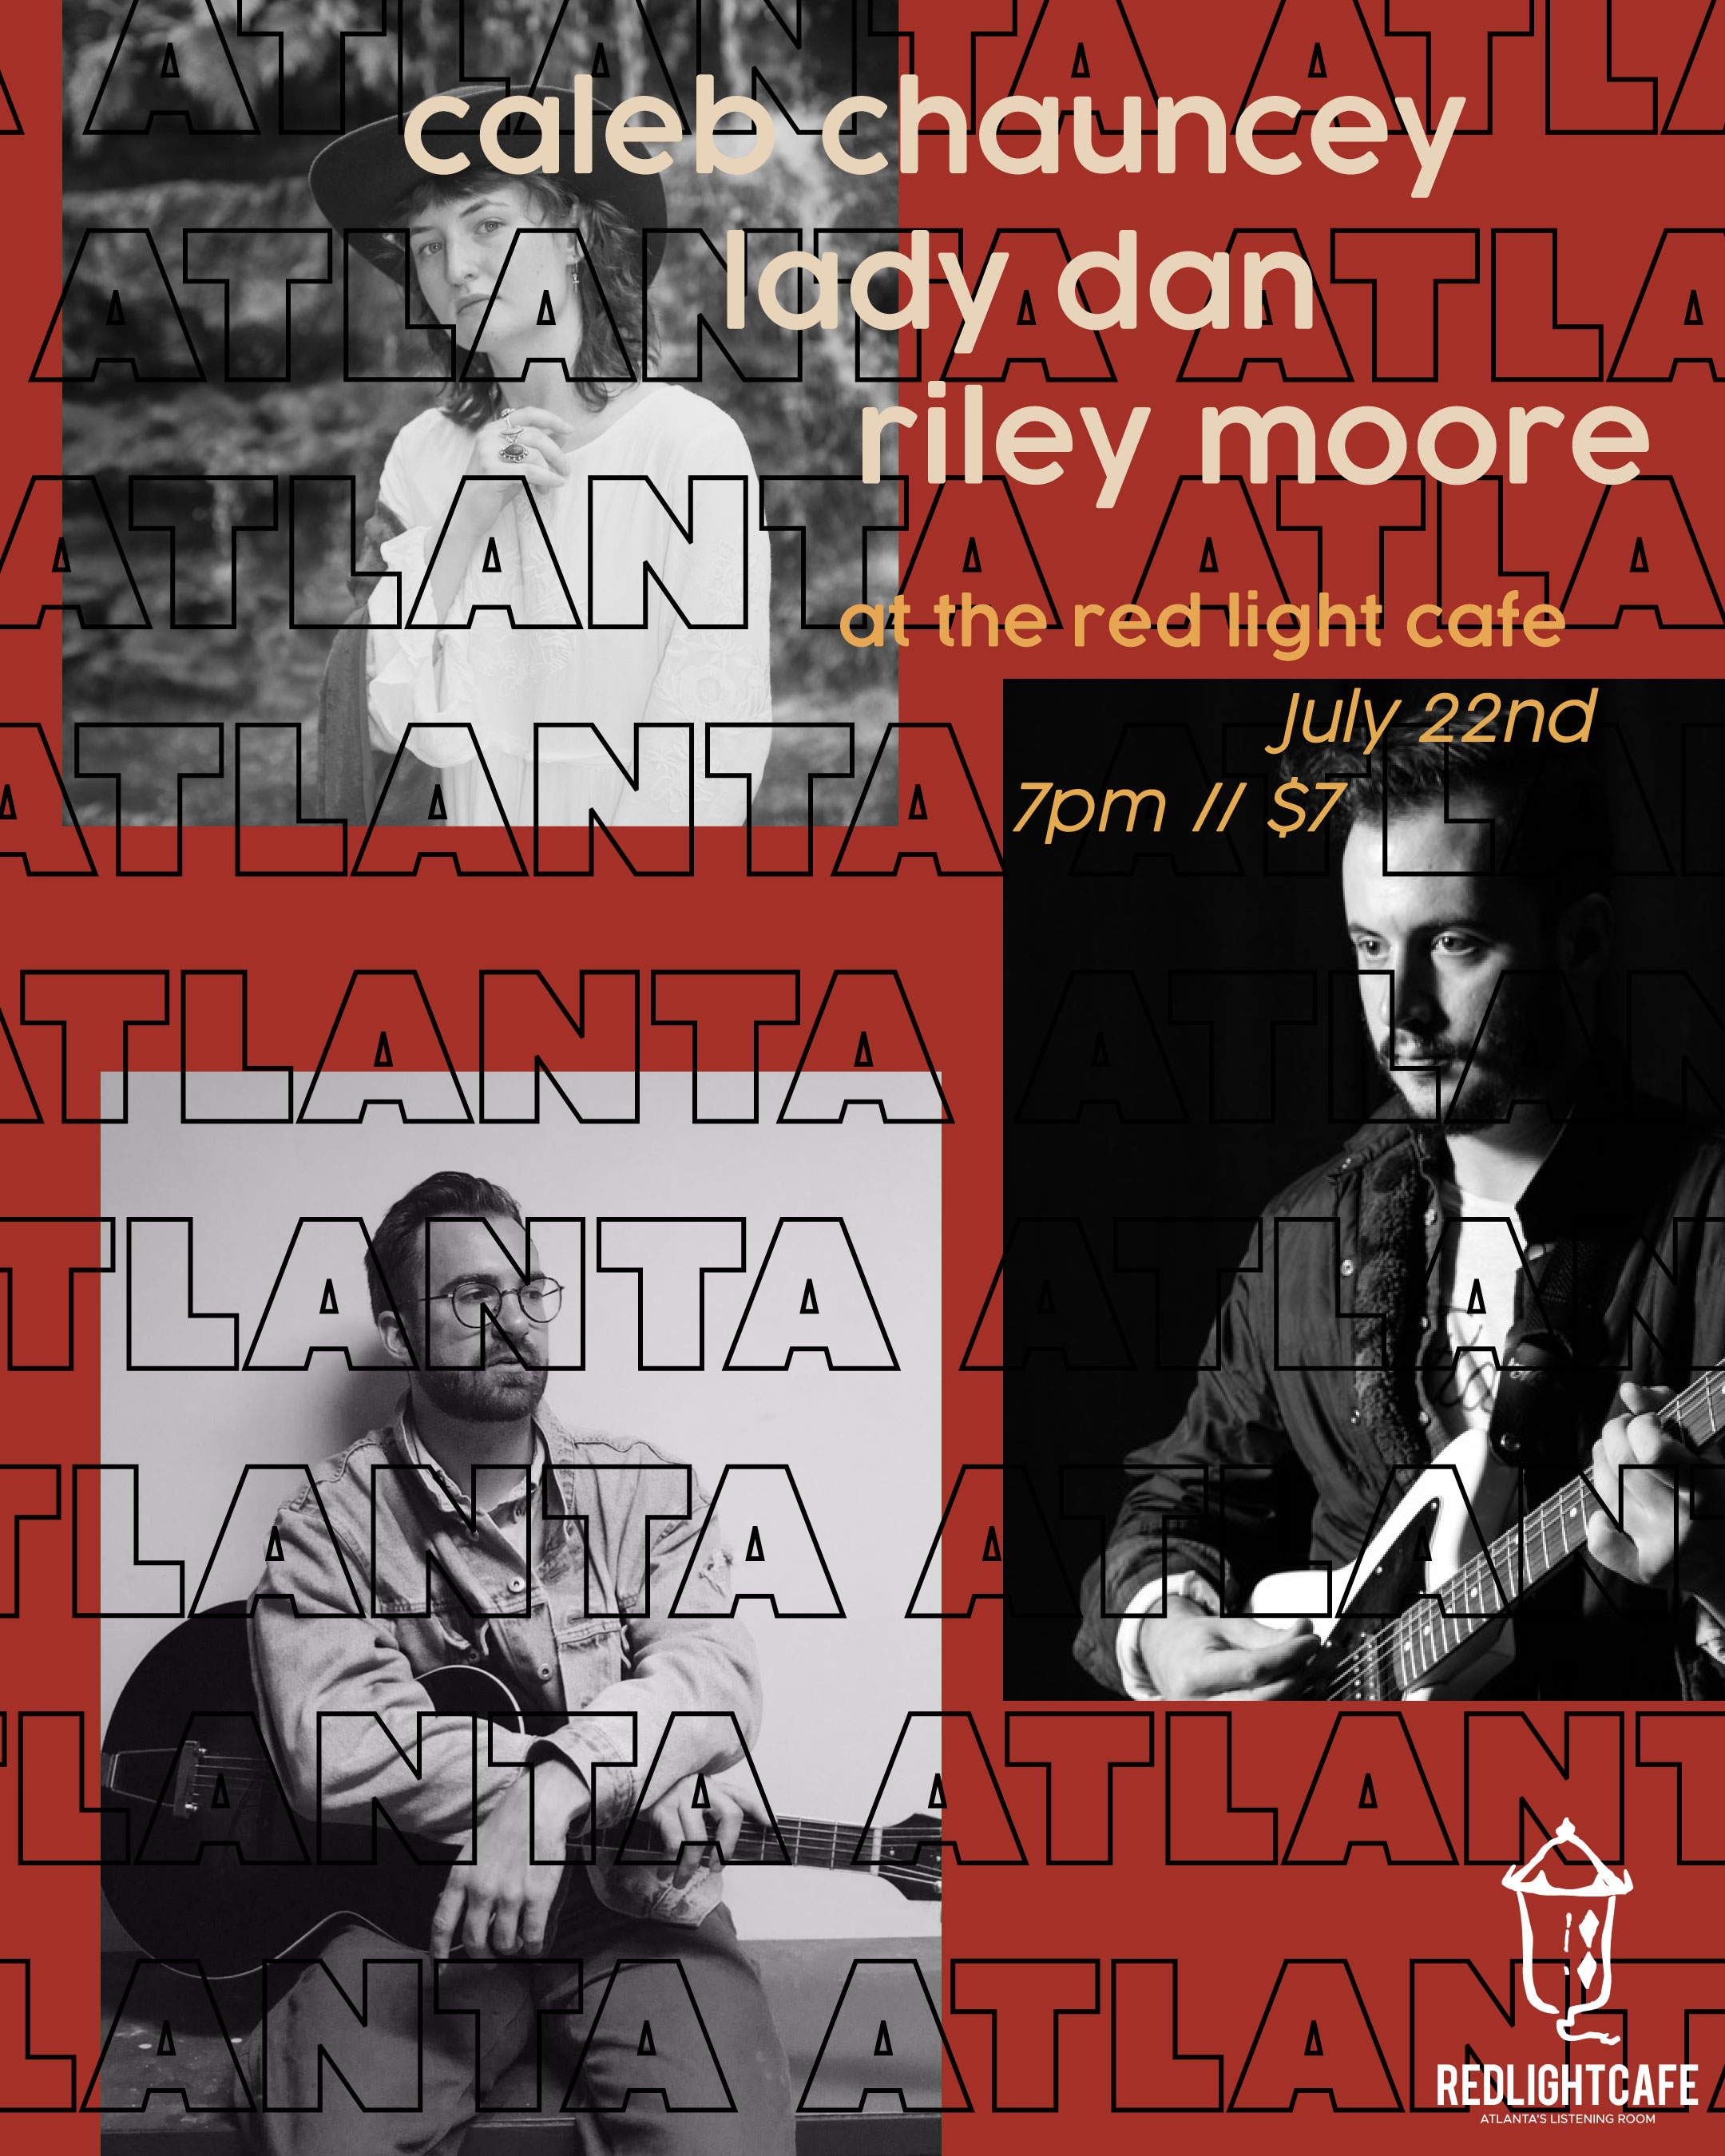 Lady Dan w/ Caleb Chauncey + Riley Moore: Saint of the Soulless Tour — July 22, 2019 — Red Light Café, Atlanta, GA